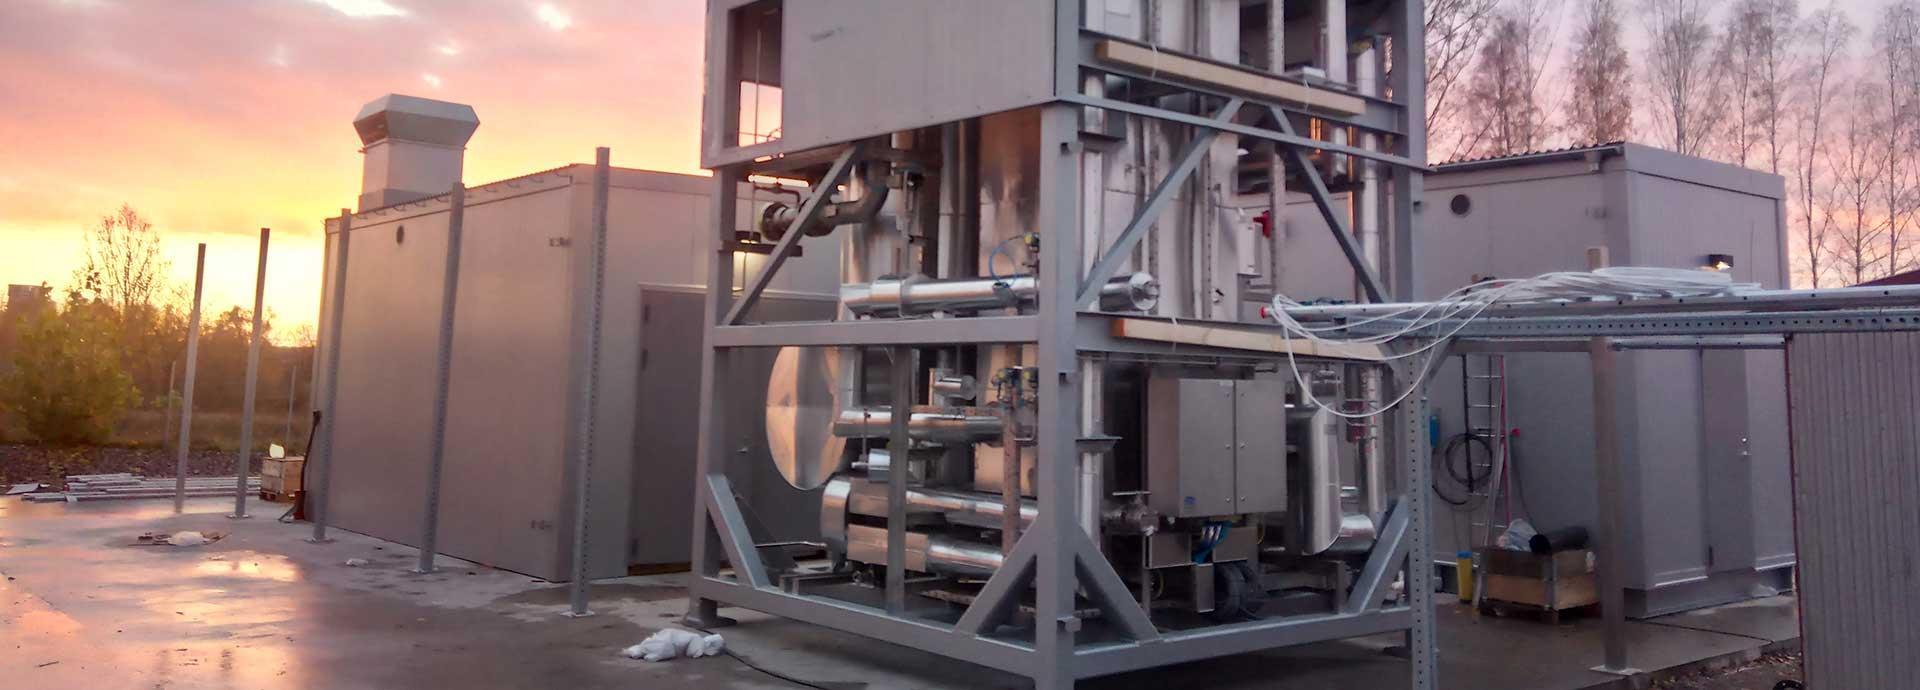 Wärtsilä supports fossil-free future with Linköping liquid biogas plant